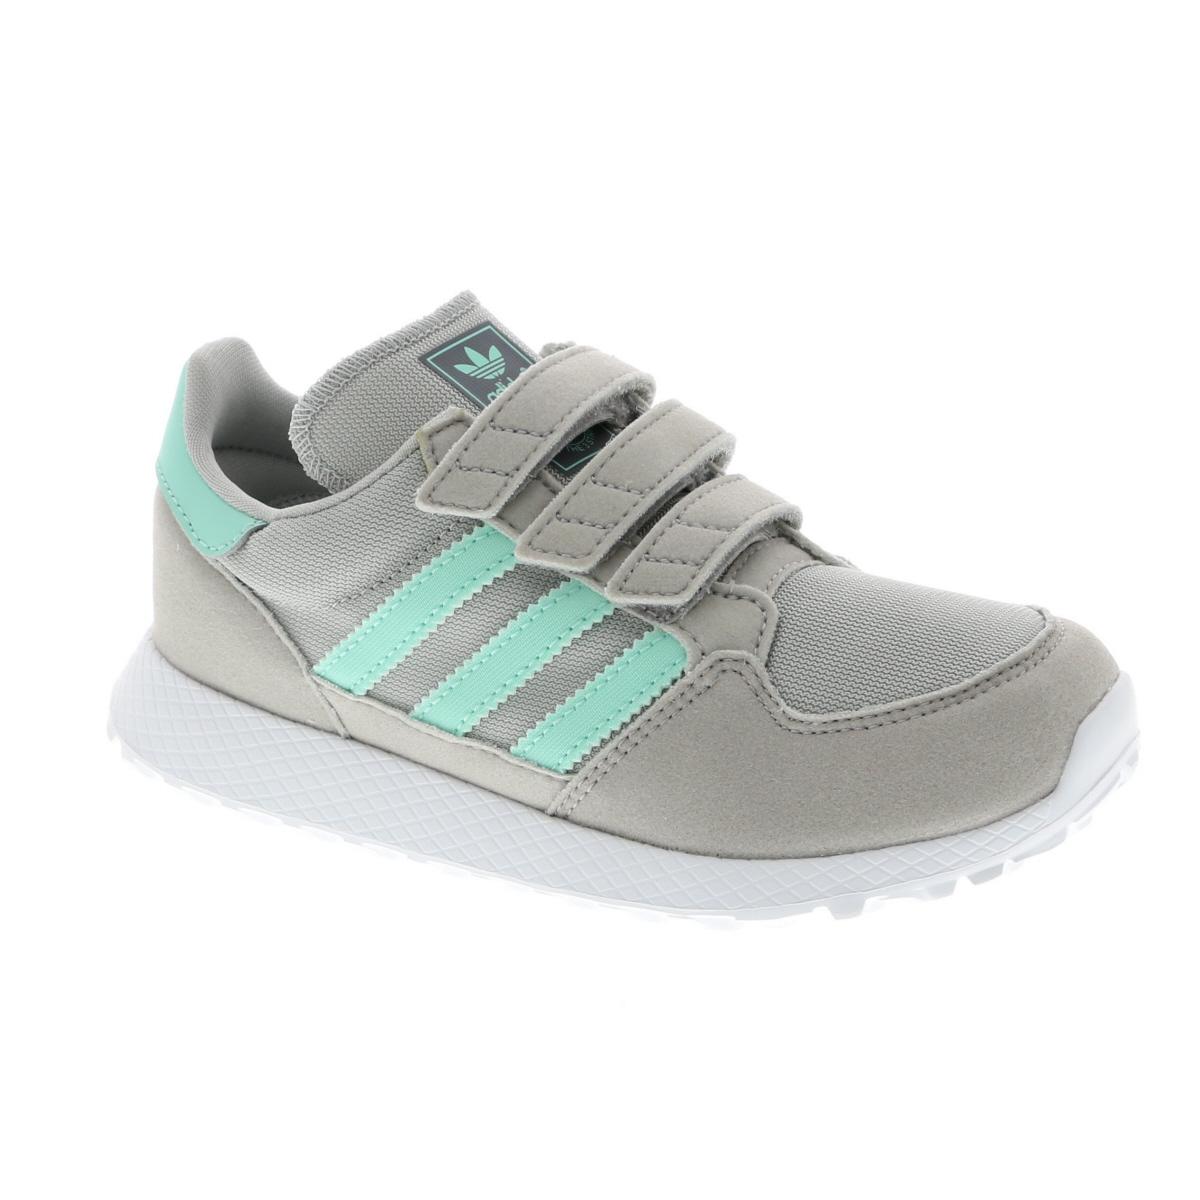 7829a5408f6e64 adidas originals kinderkleding bestel je online bij